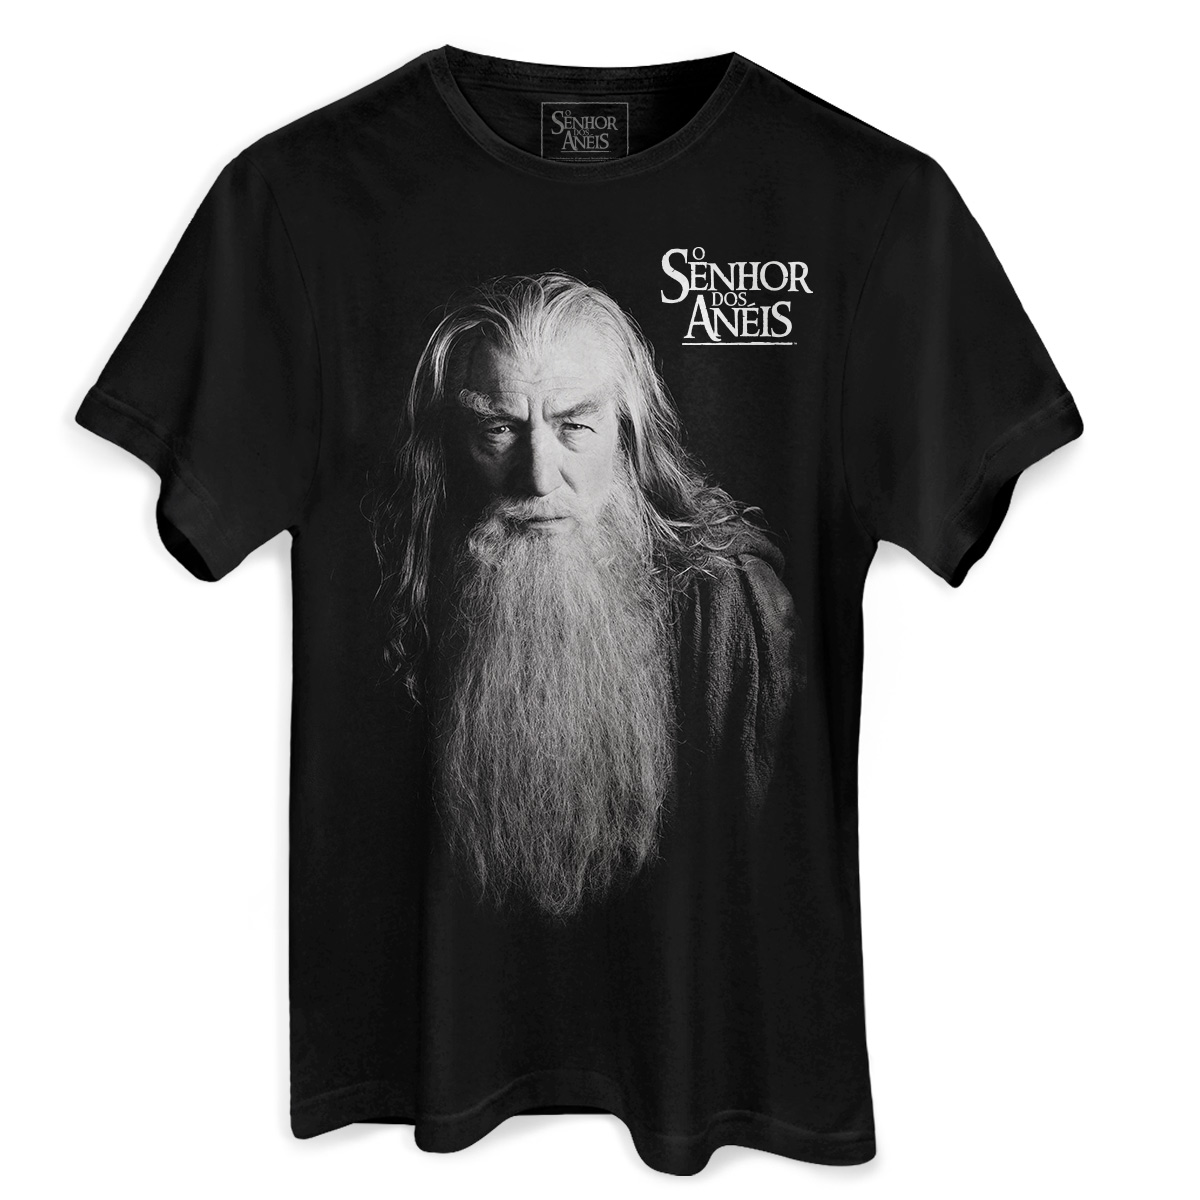 Camiseta Masculina O Senhor dos Anéis Gandalf